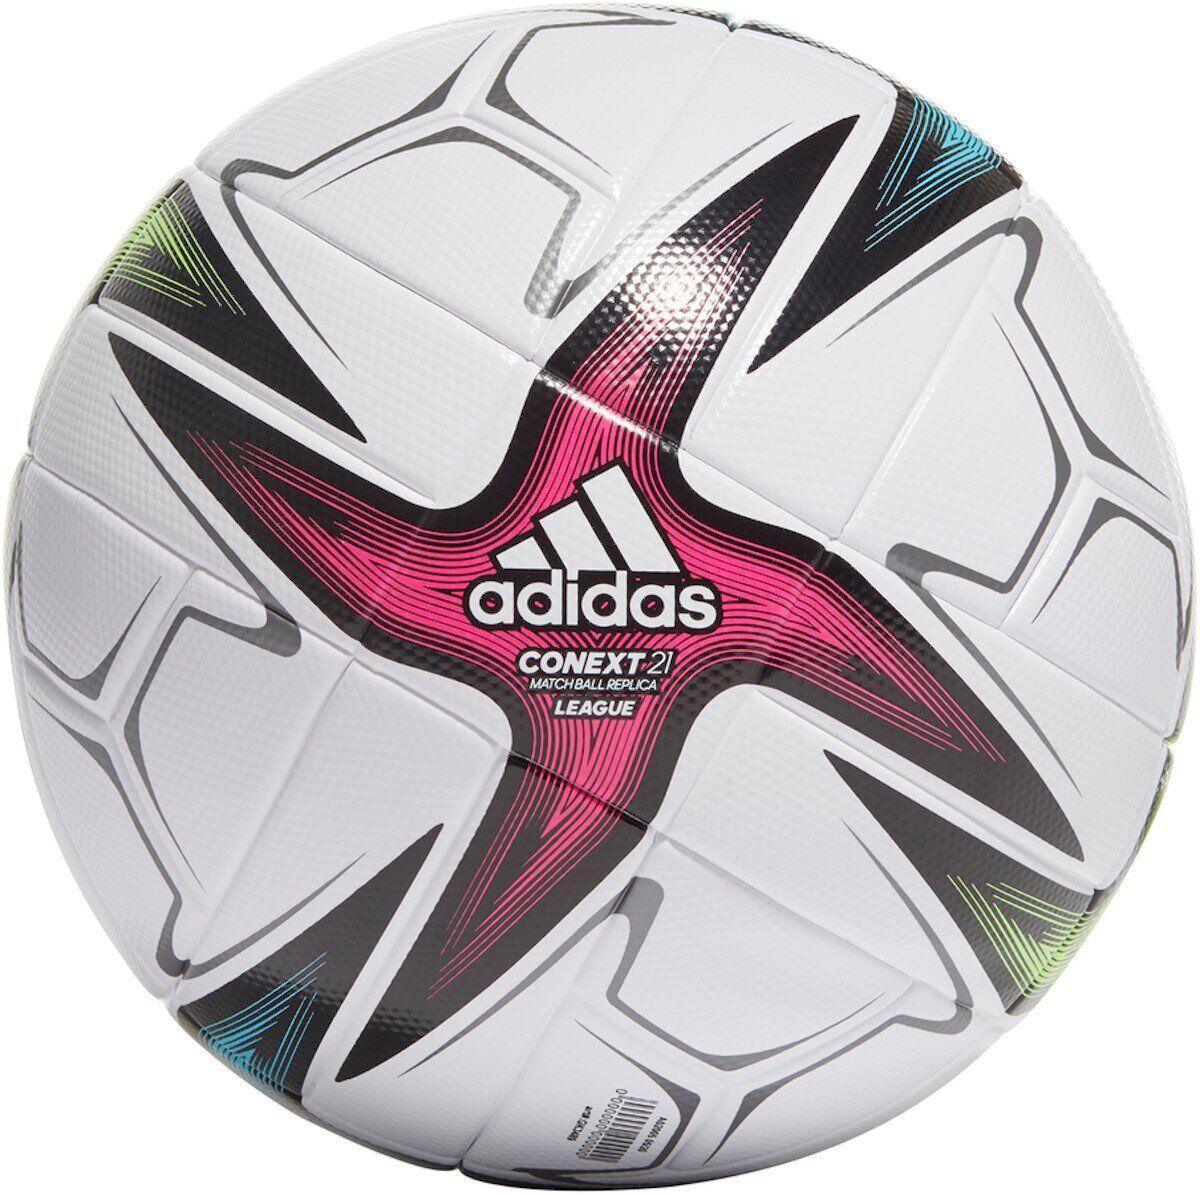 Футбольний м'яч Adidas Conext 21 League GK3489